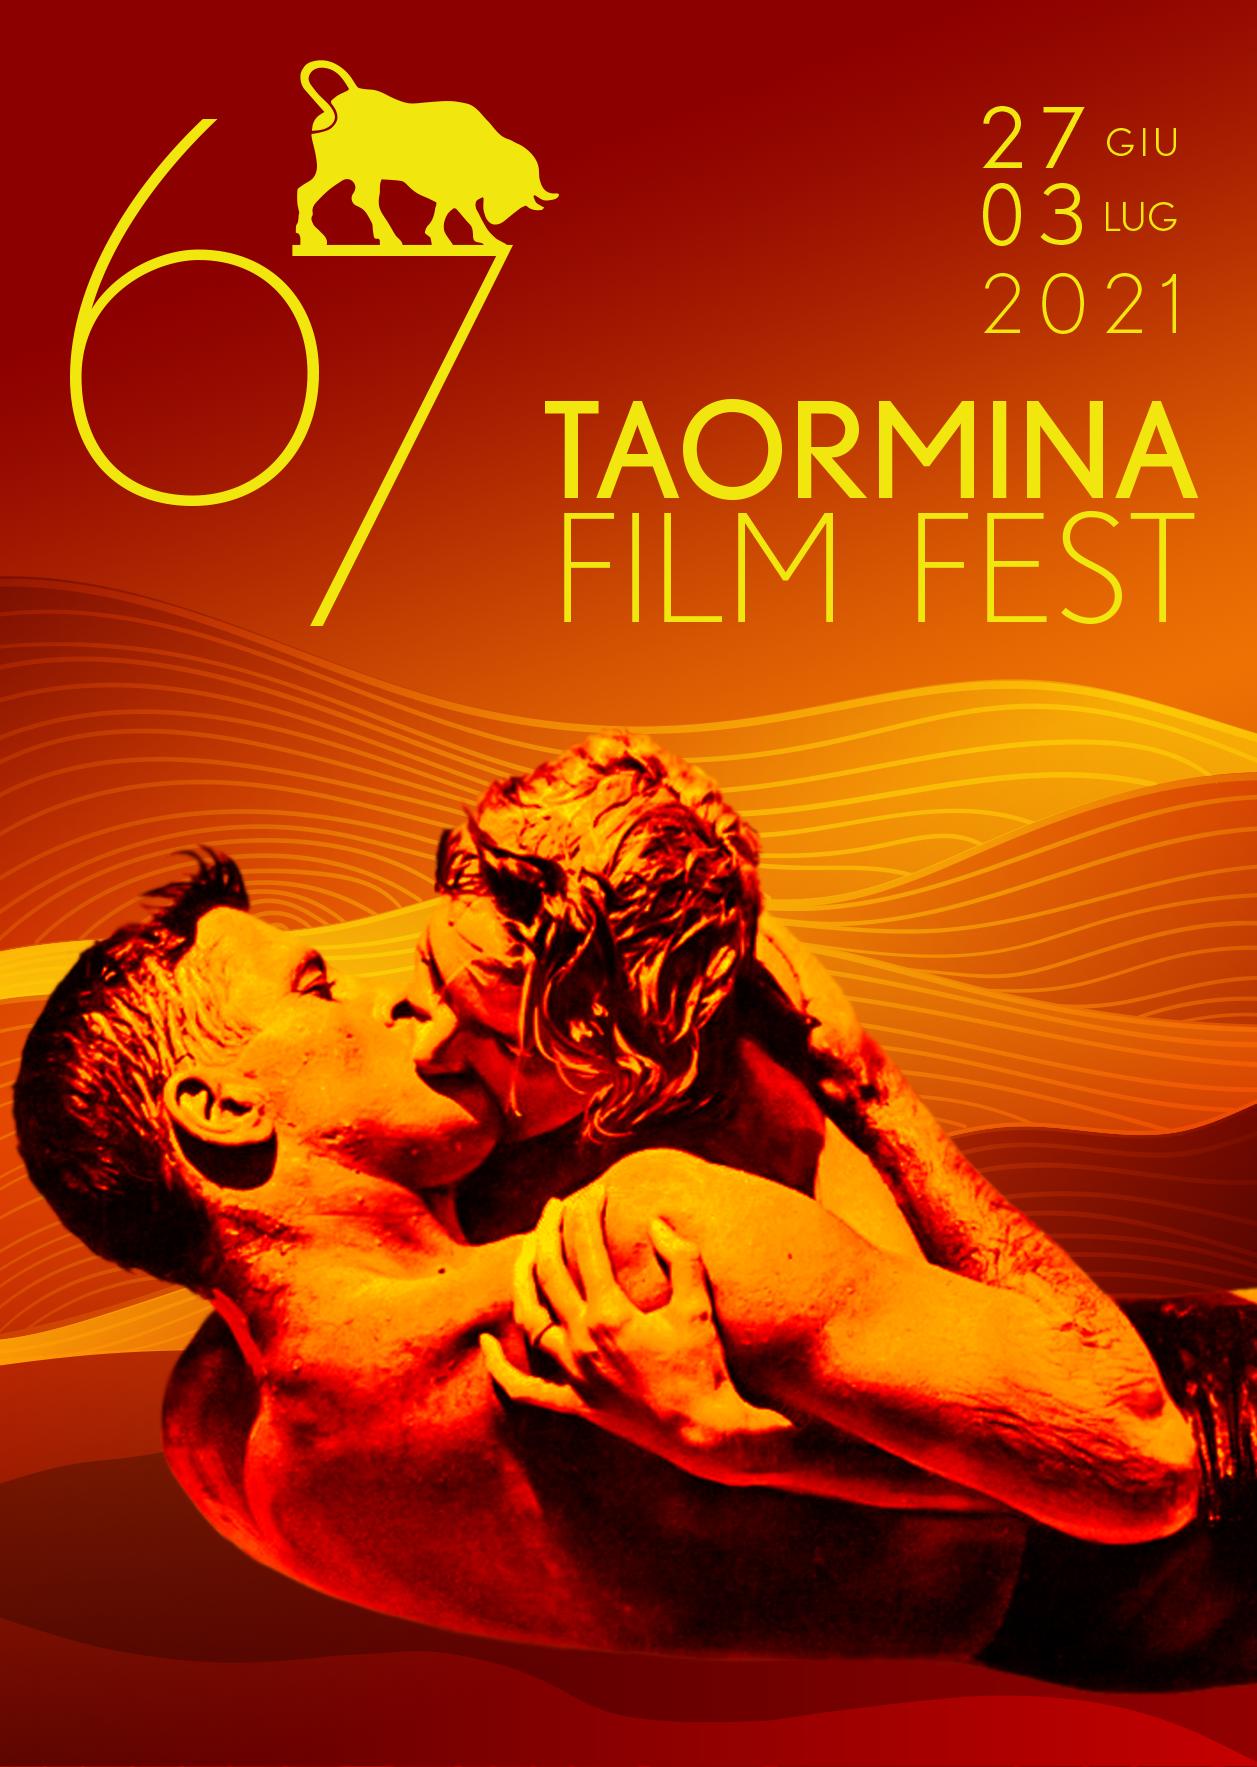 Taormina Film Fest 2021